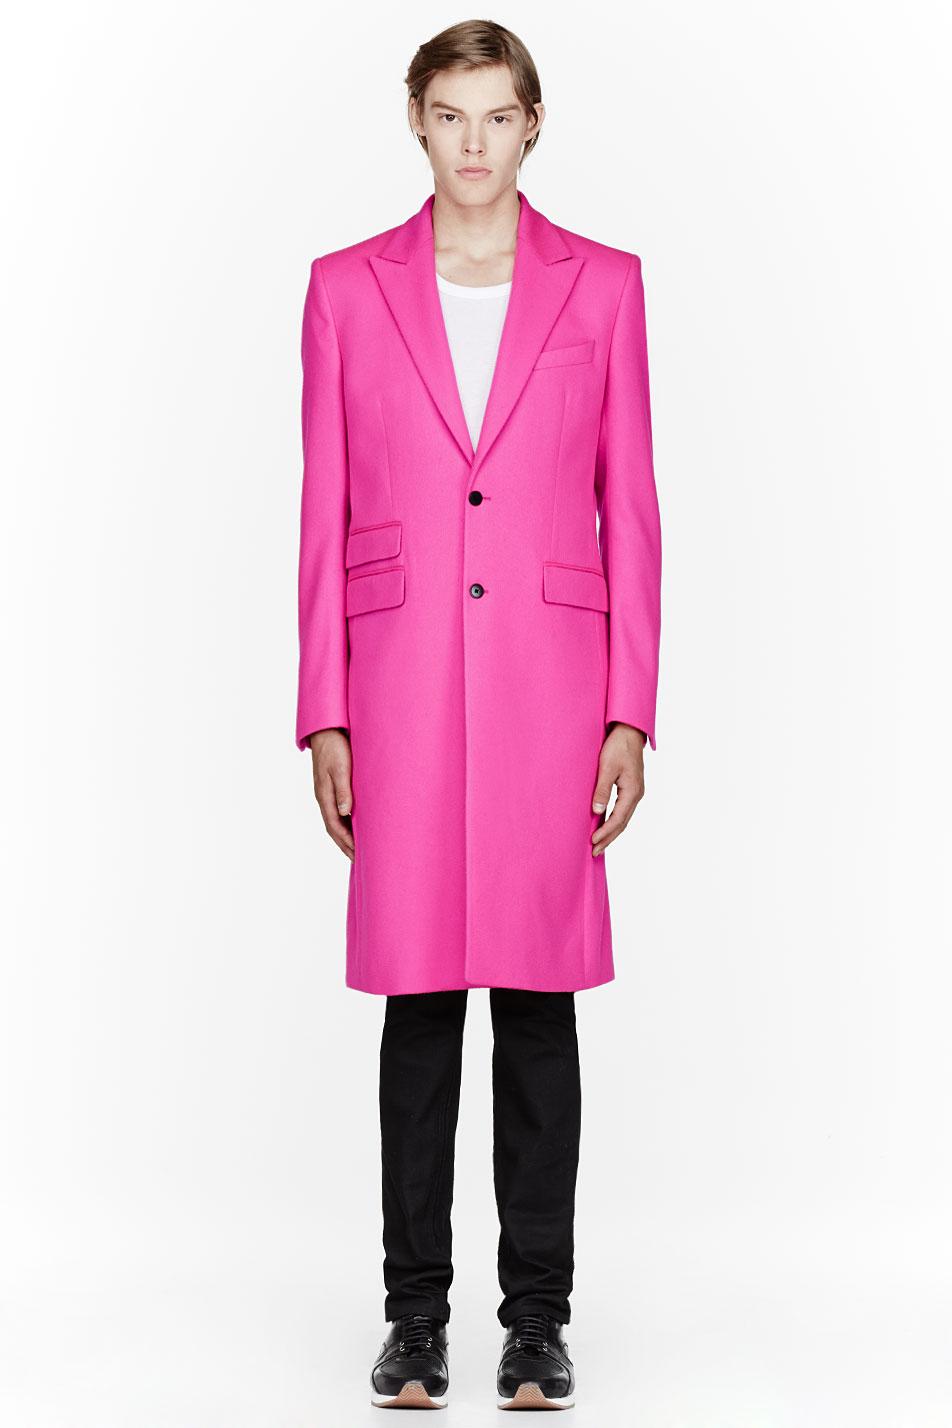 Mugler Fluorescent Pink Wool Coat In Pink For Men Lyst